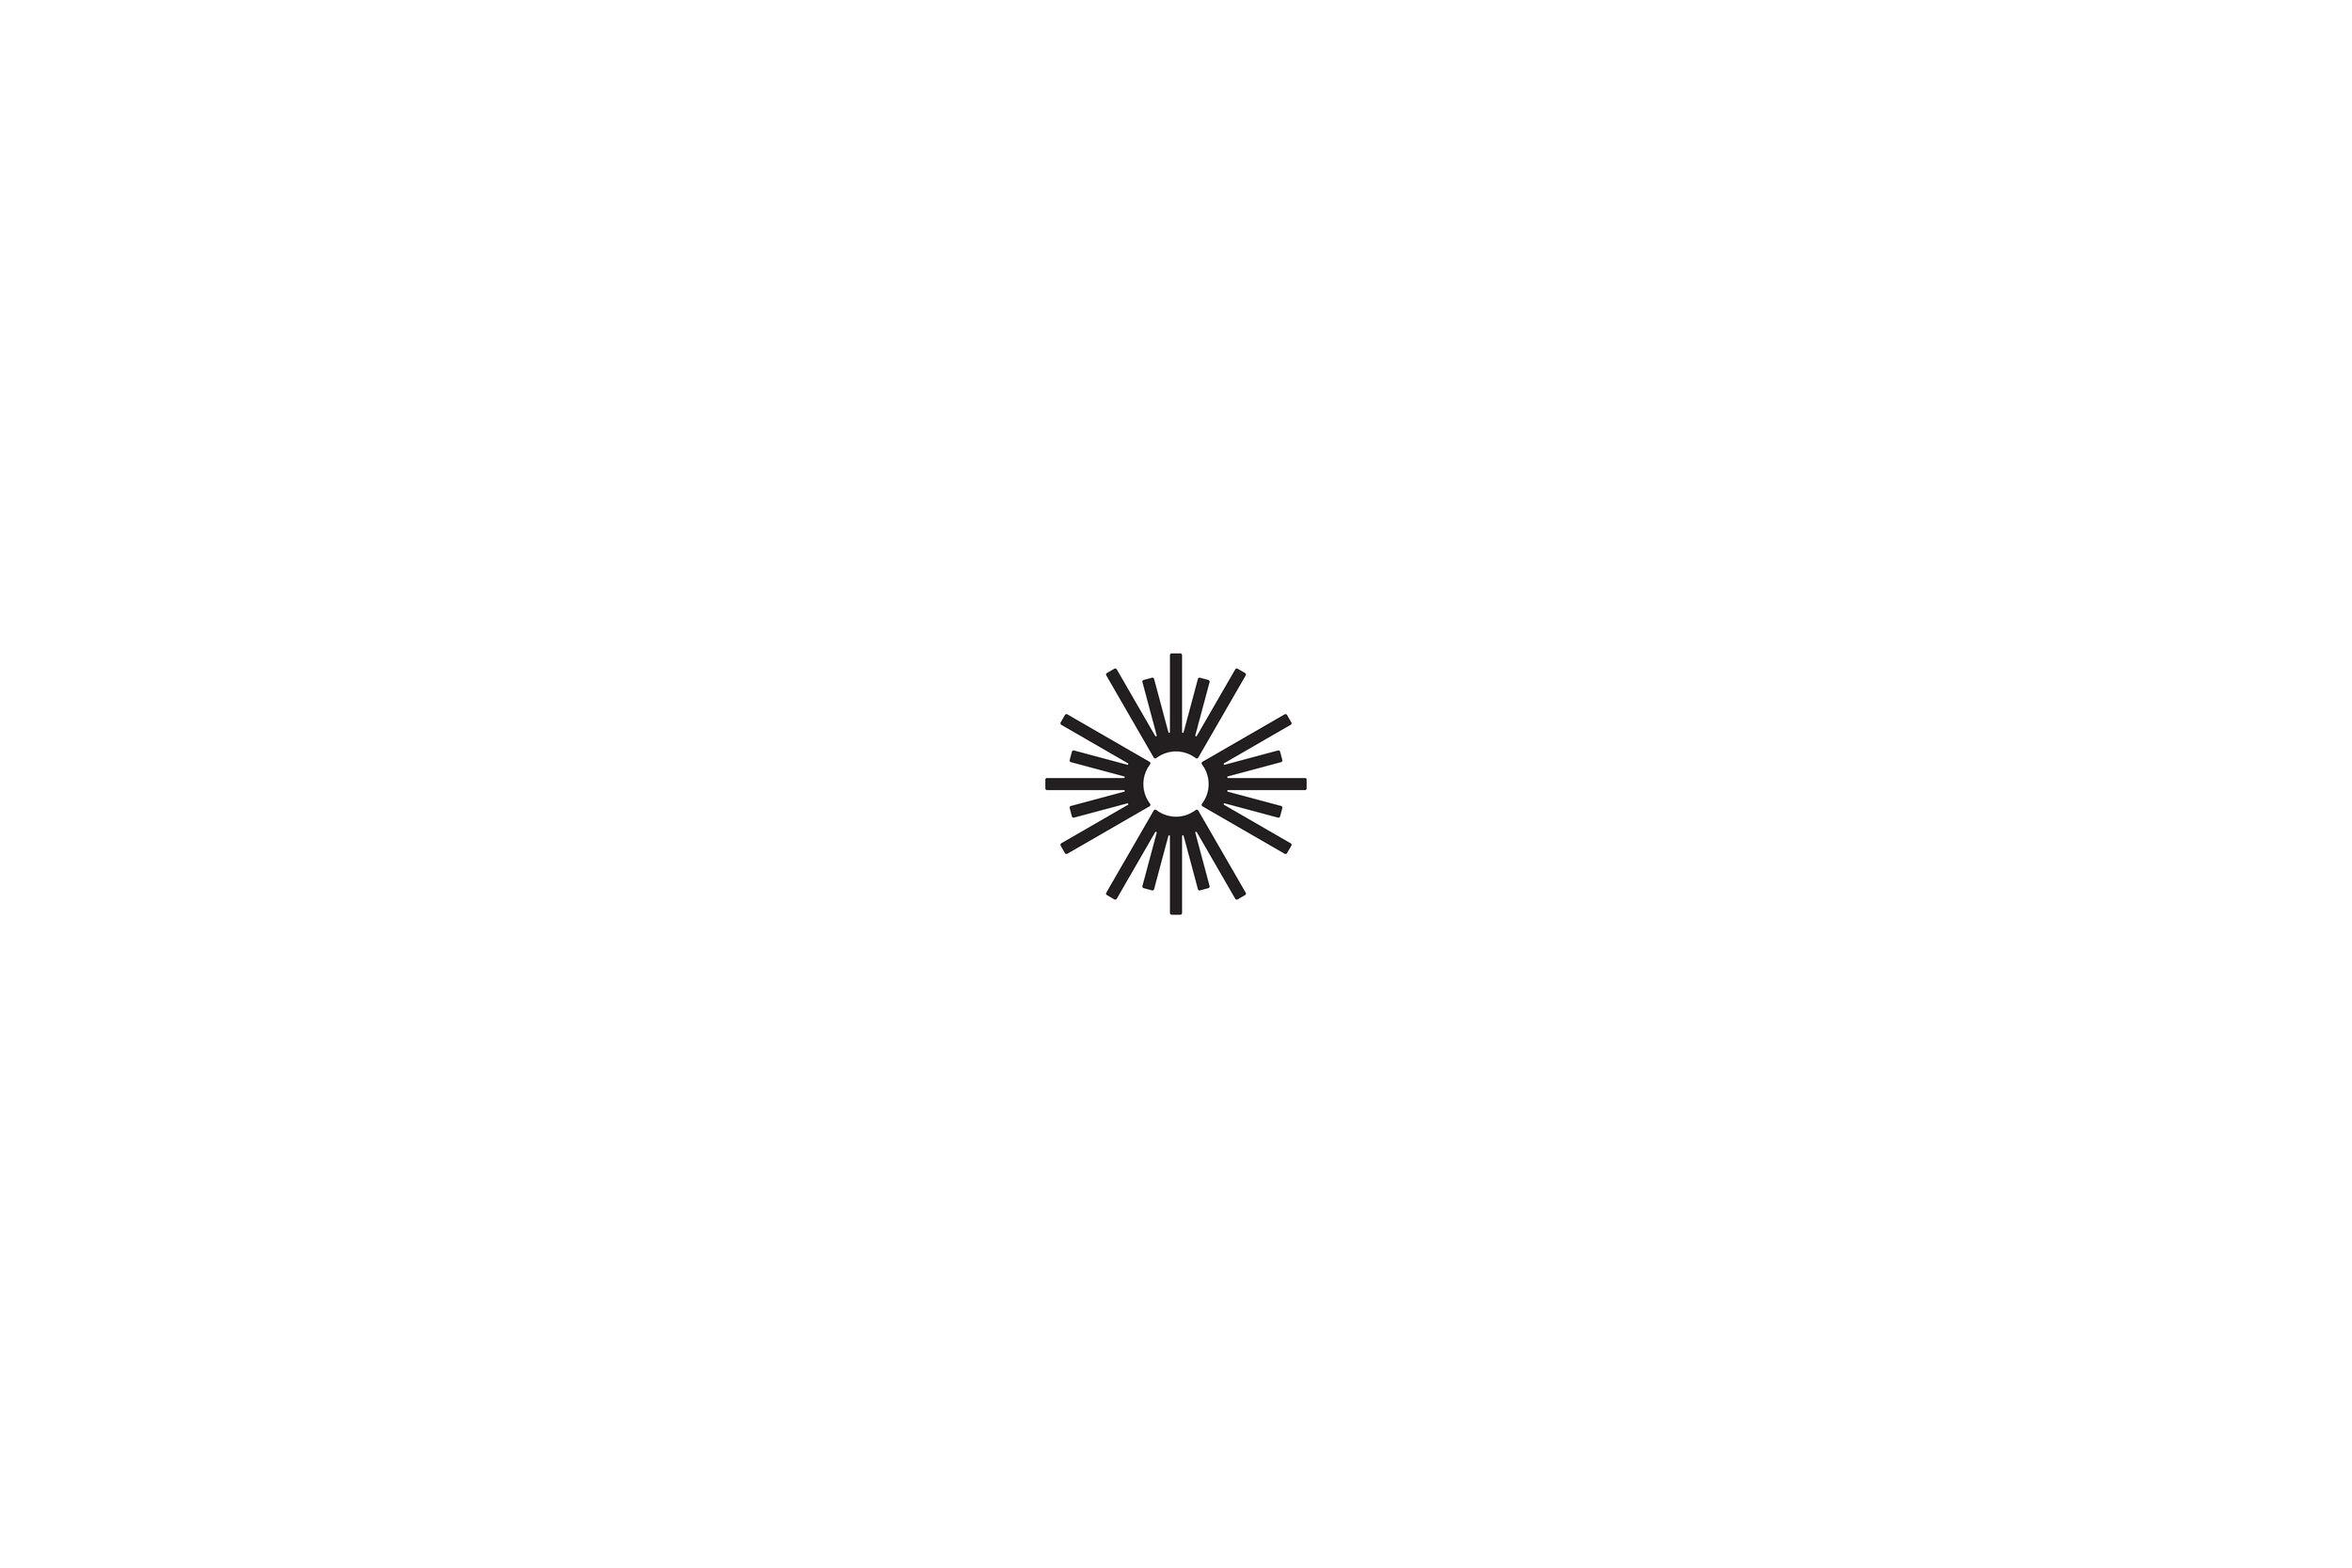 vortic_facebook_logocollection2-13